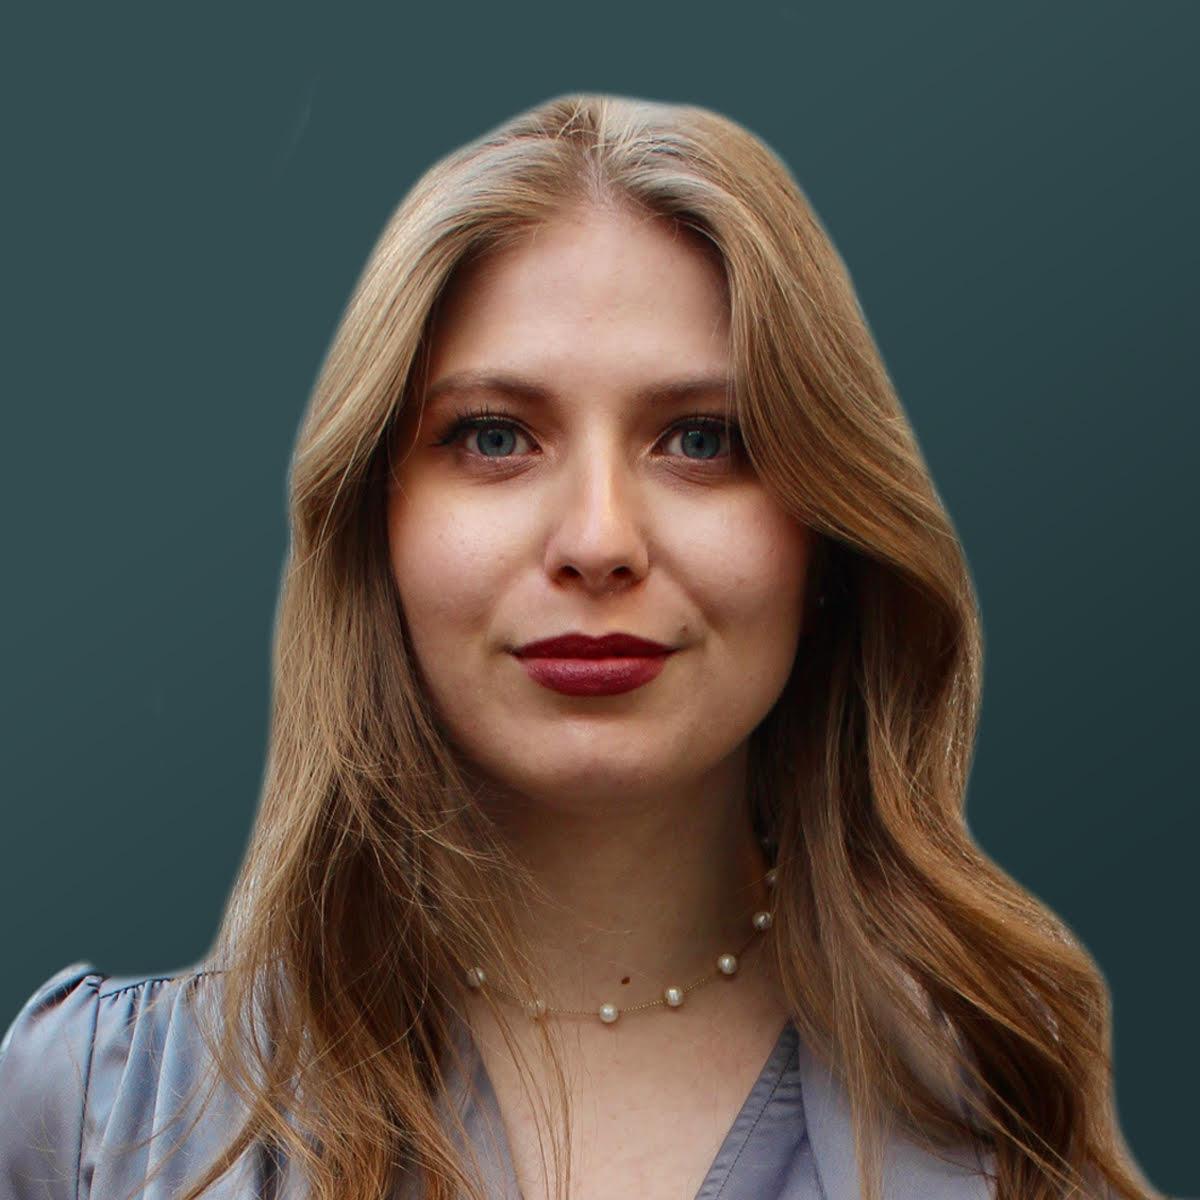 Adela Iacobov